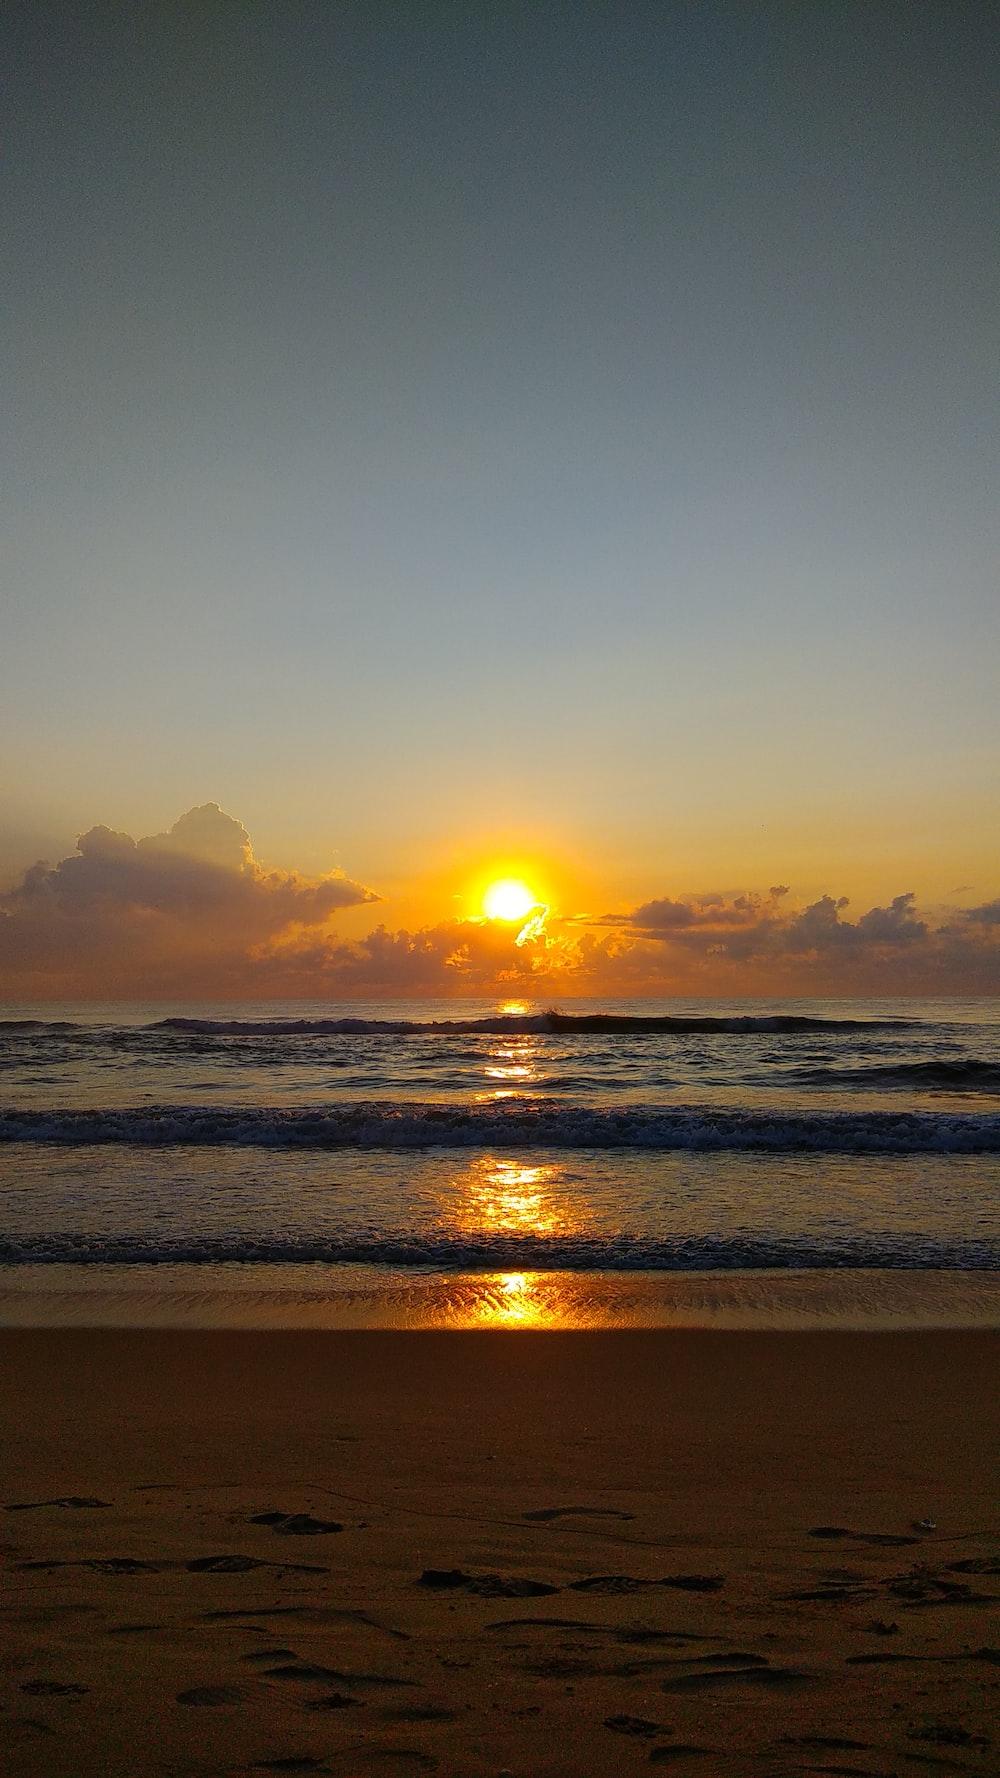 ocean wave during golden hour time